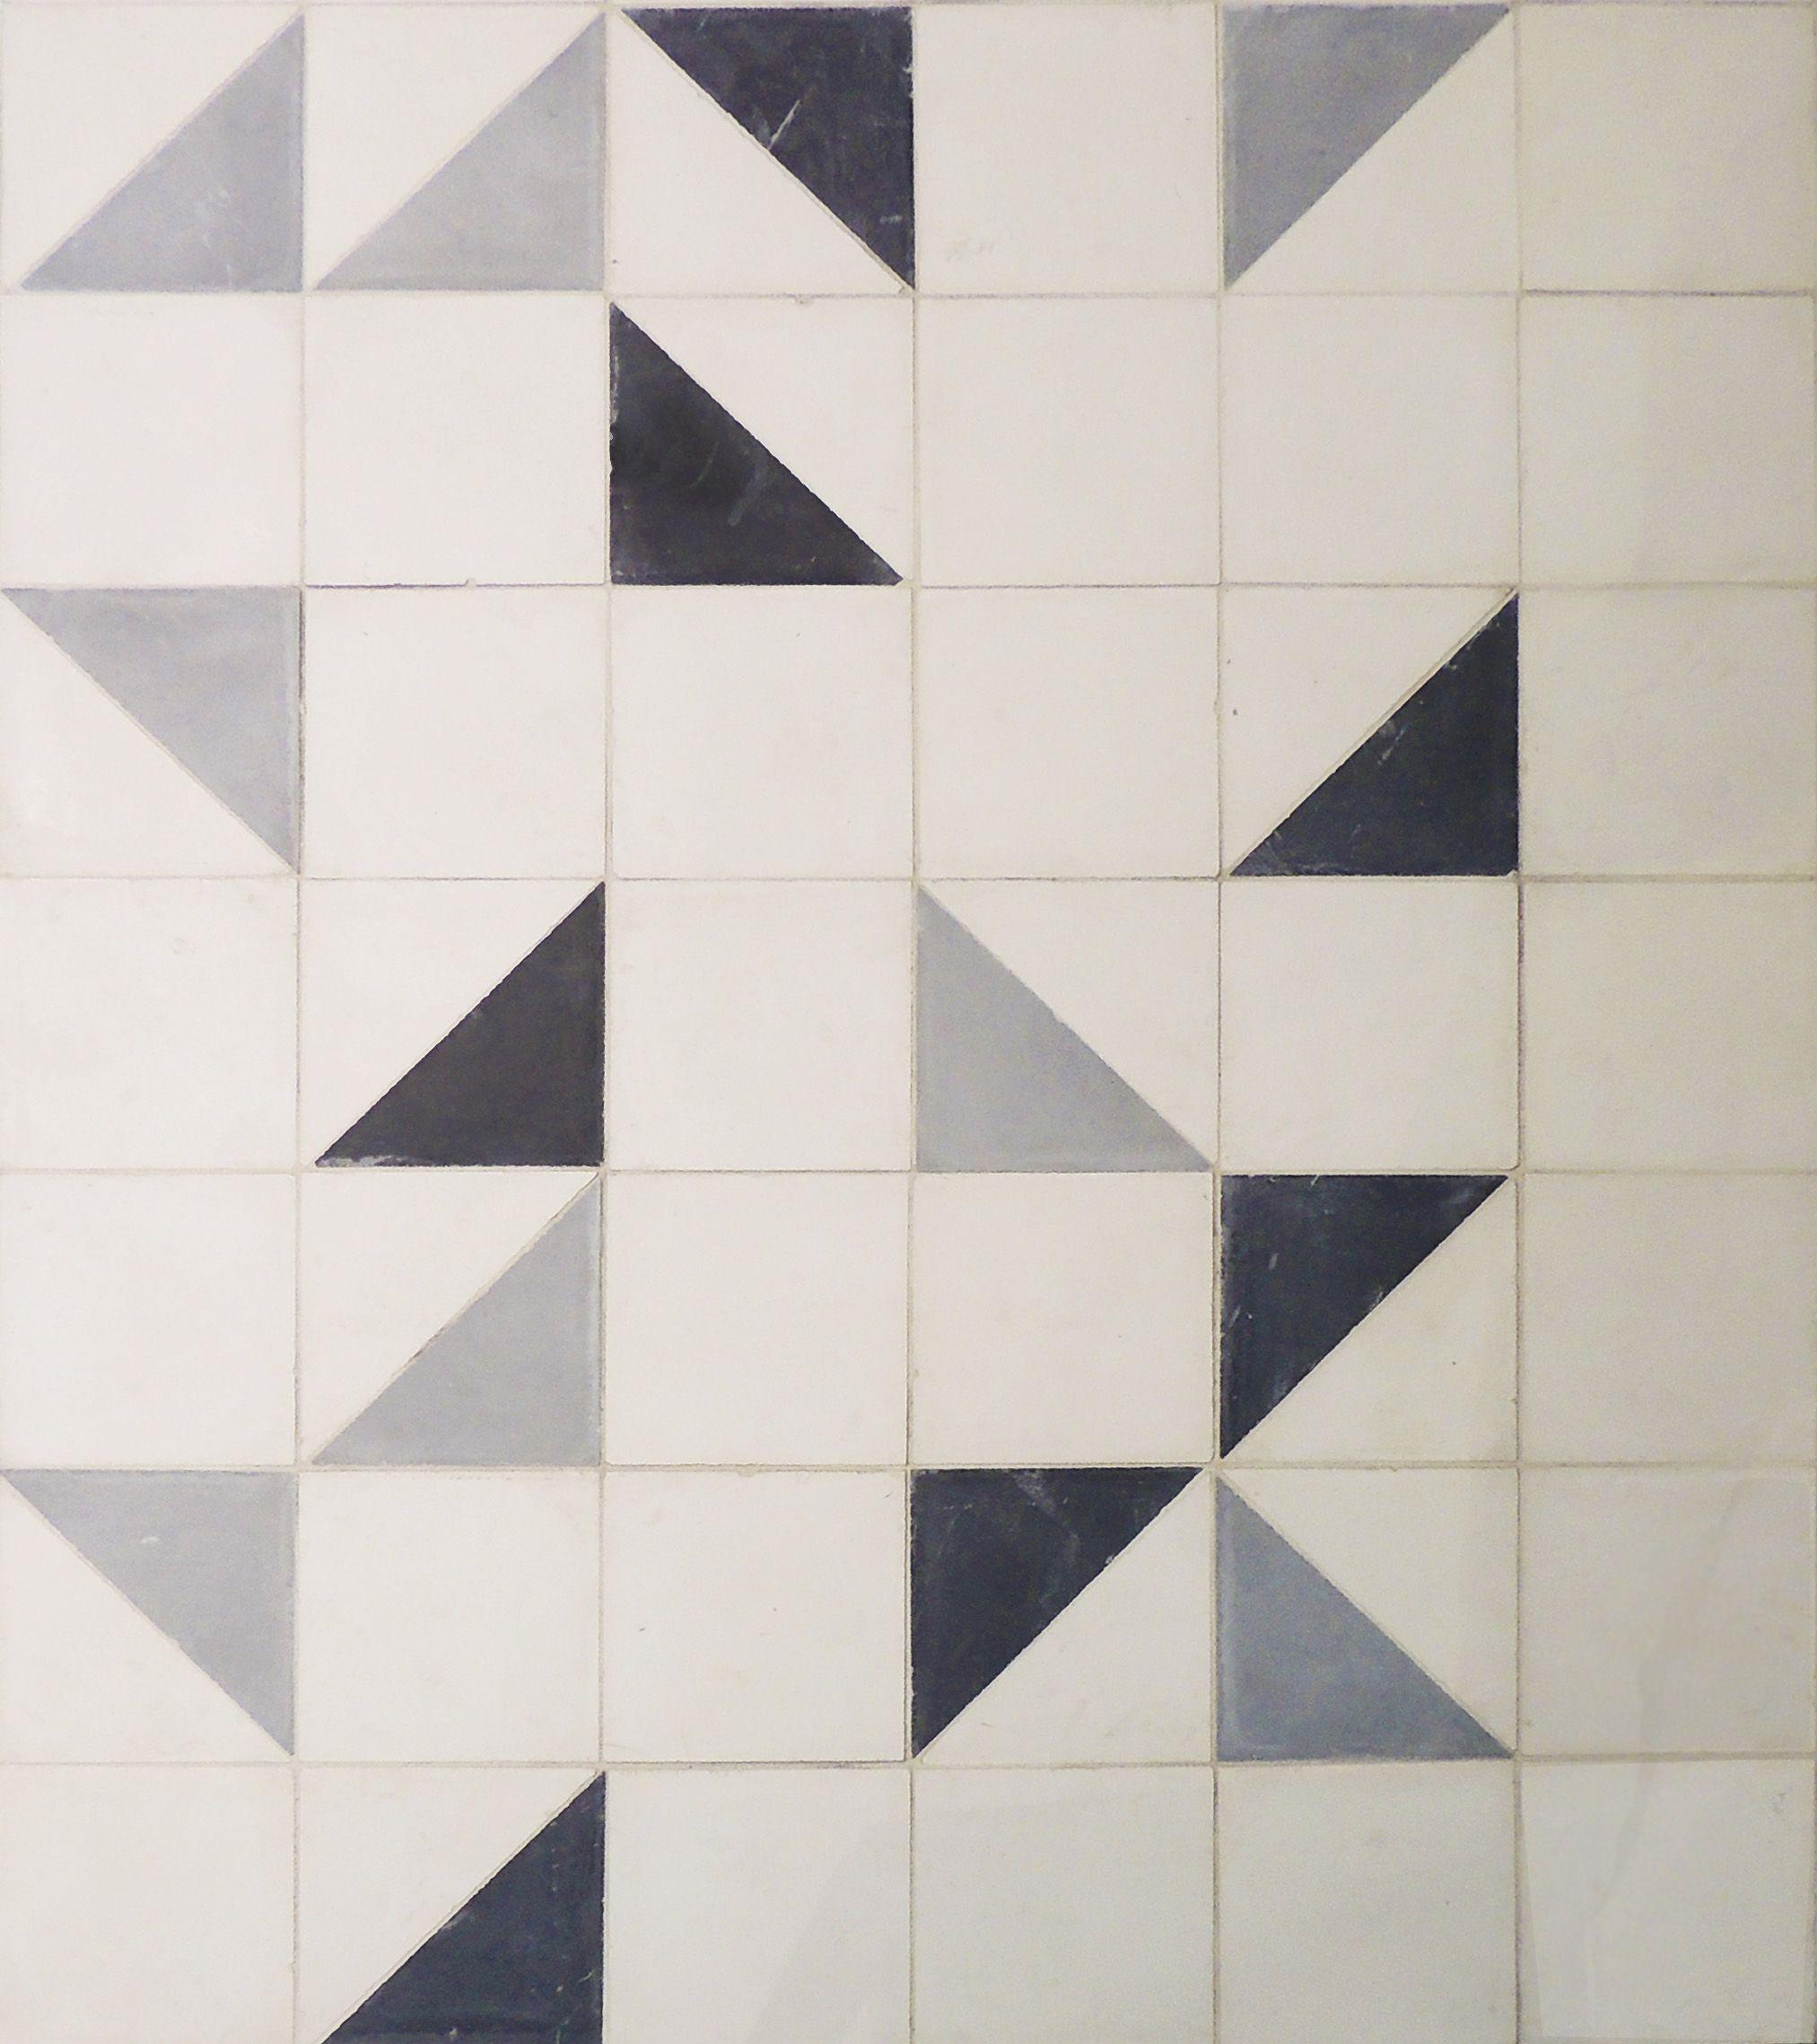 Geometric floor strada cement tiles in black oxford white geometric floor strada cement tiles in black oxford white ppazfo